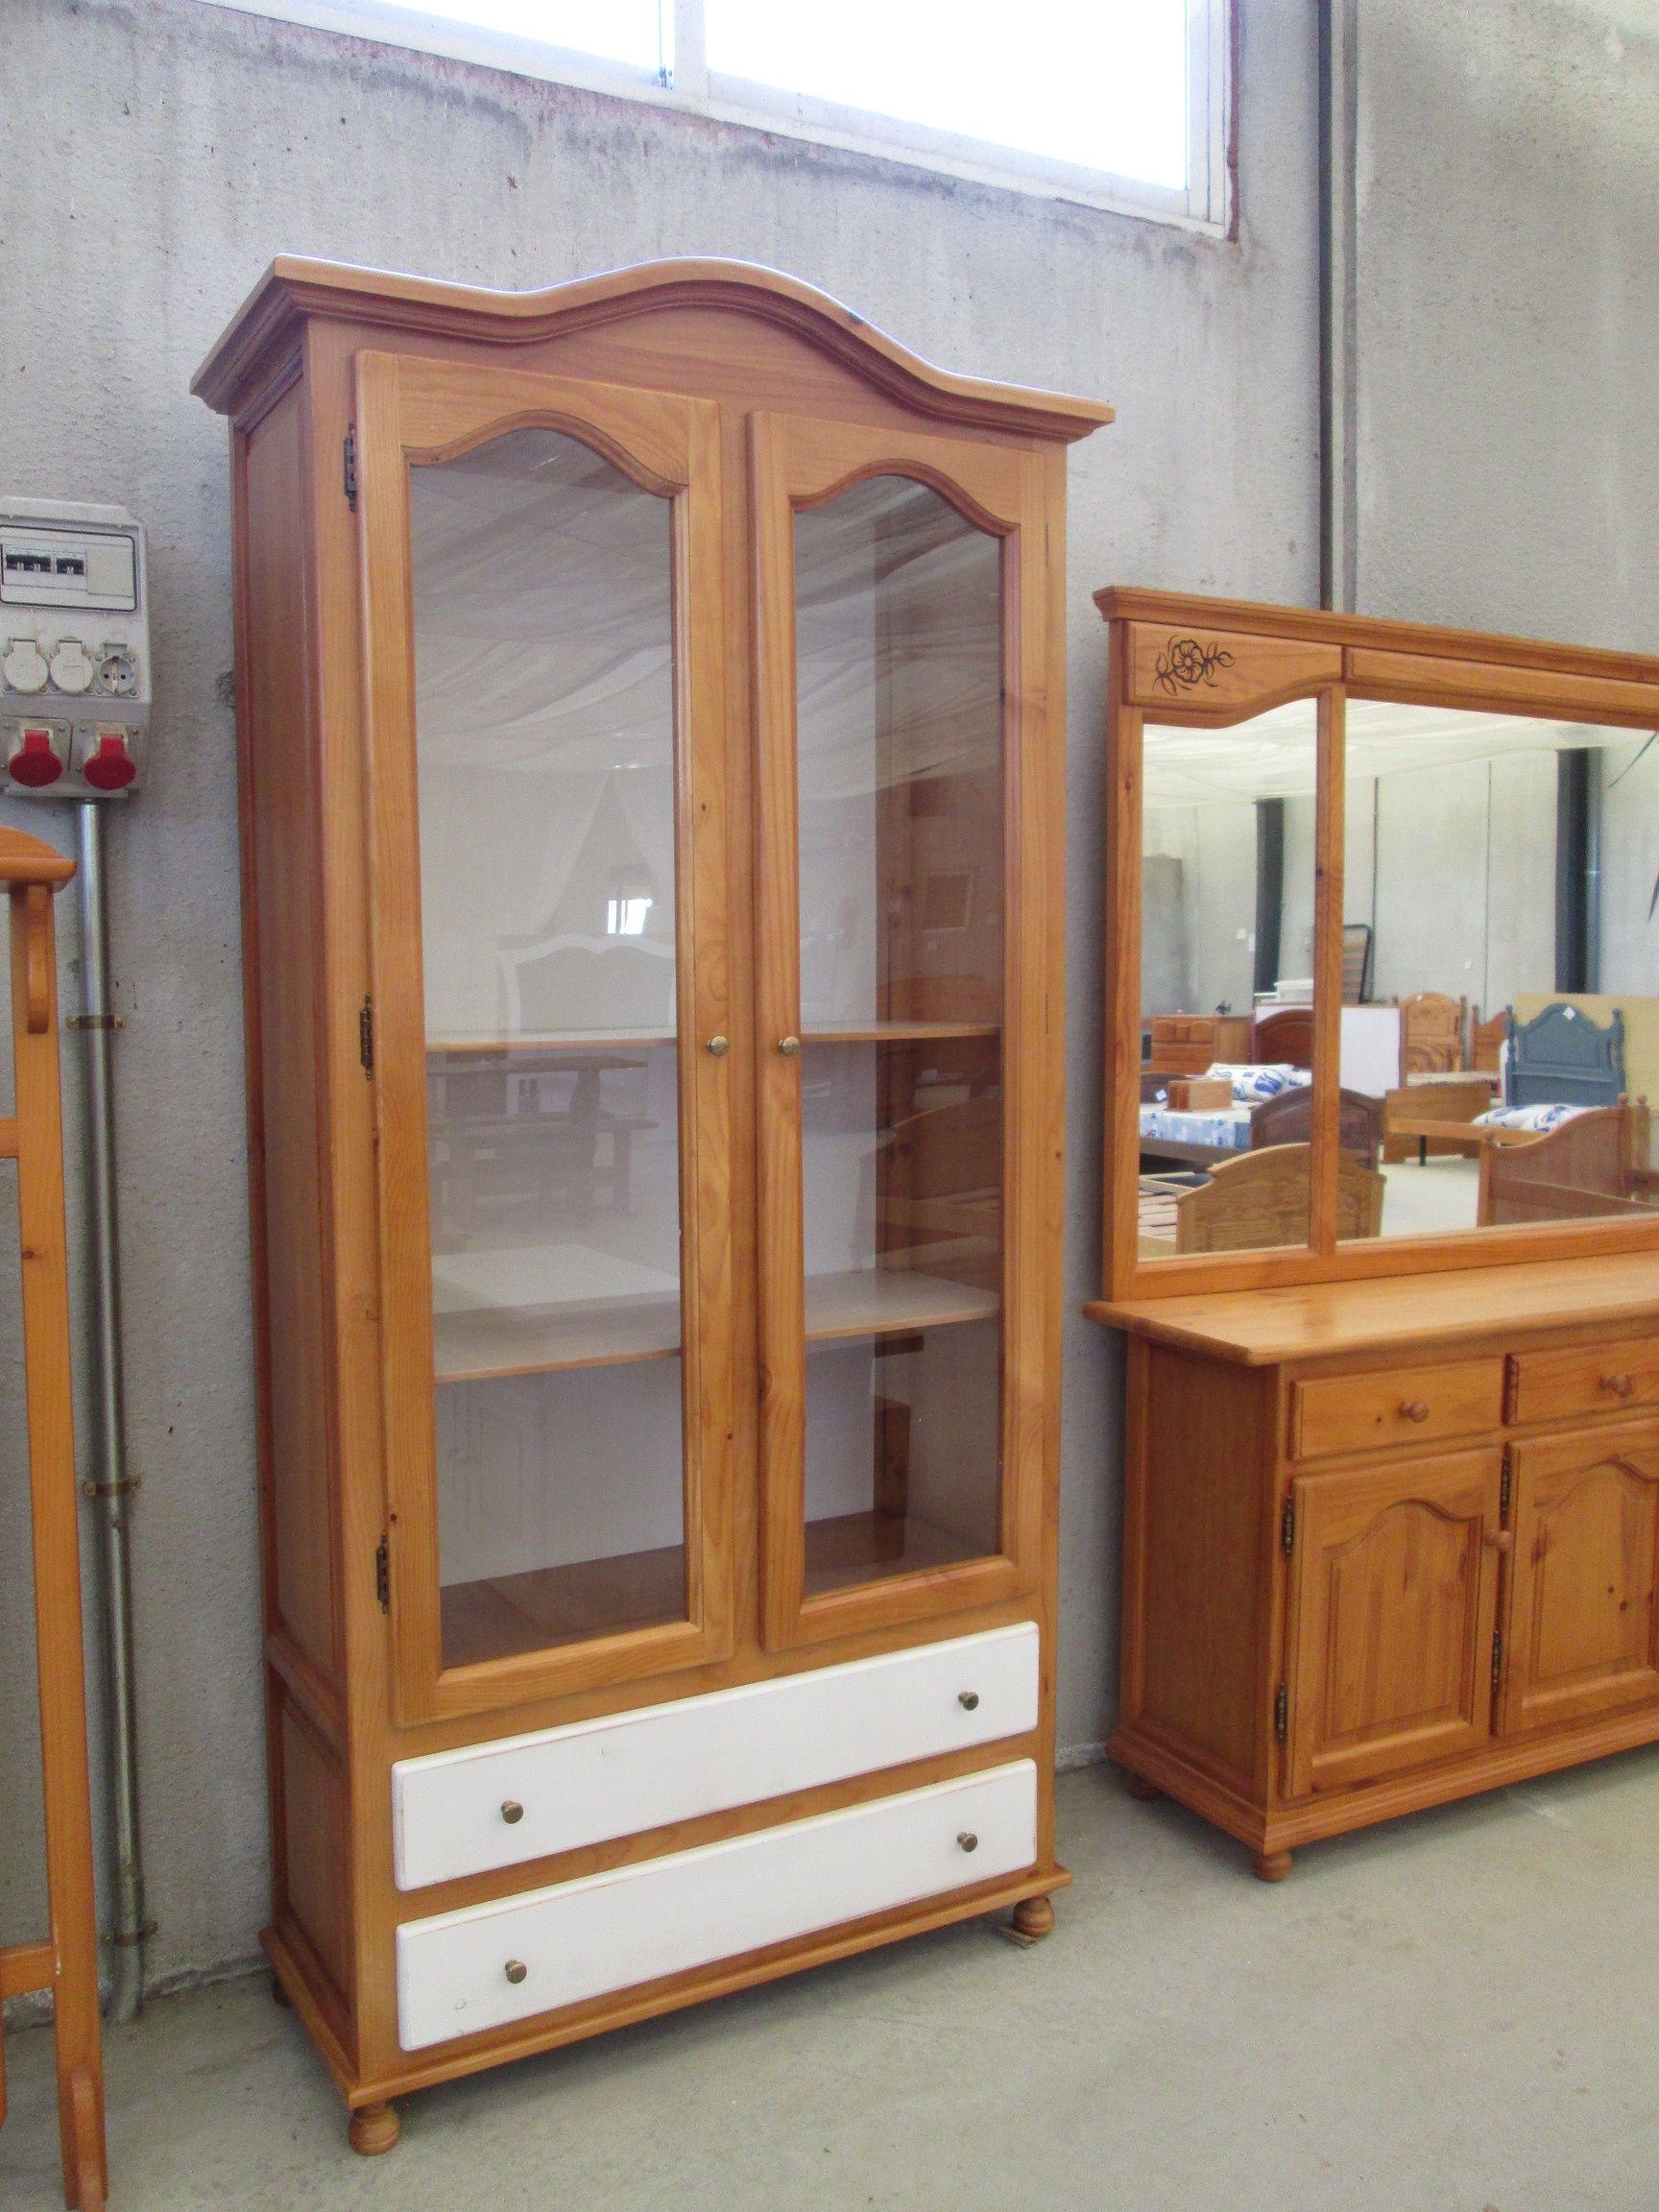 Mueble-vitrina de madera maciza en estilo provenzal de 100cm de ...